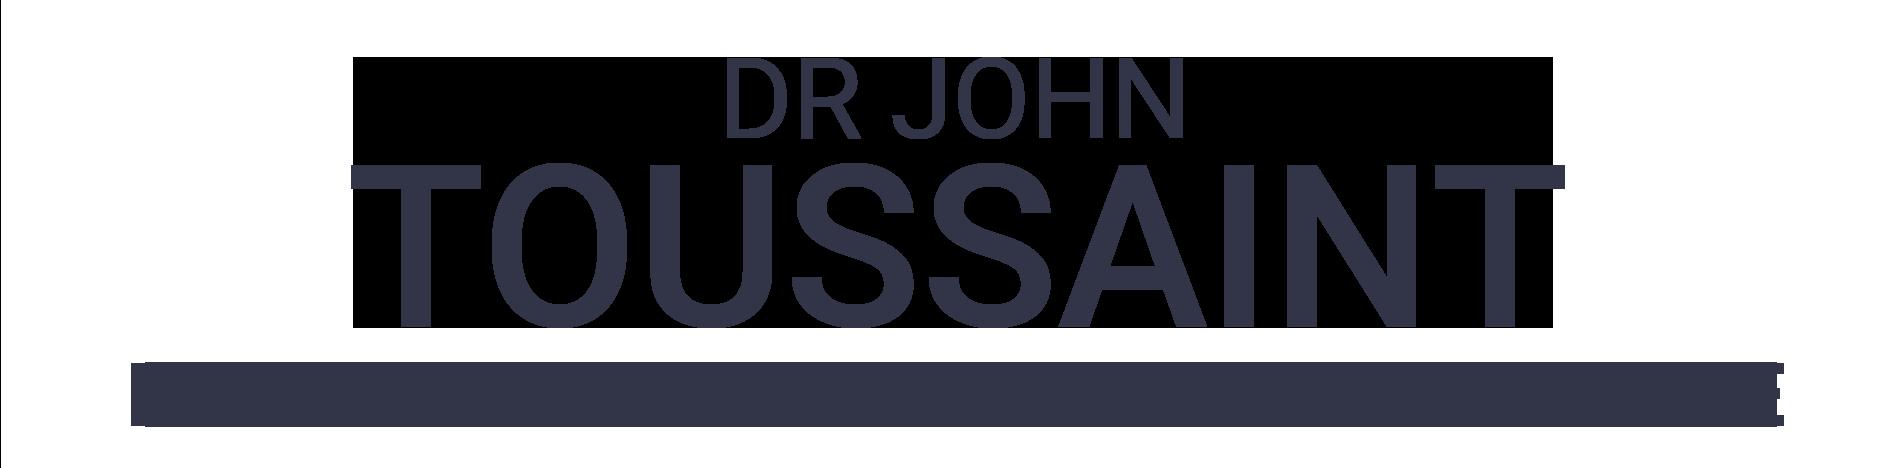 DR JOHN TOUSSAINT